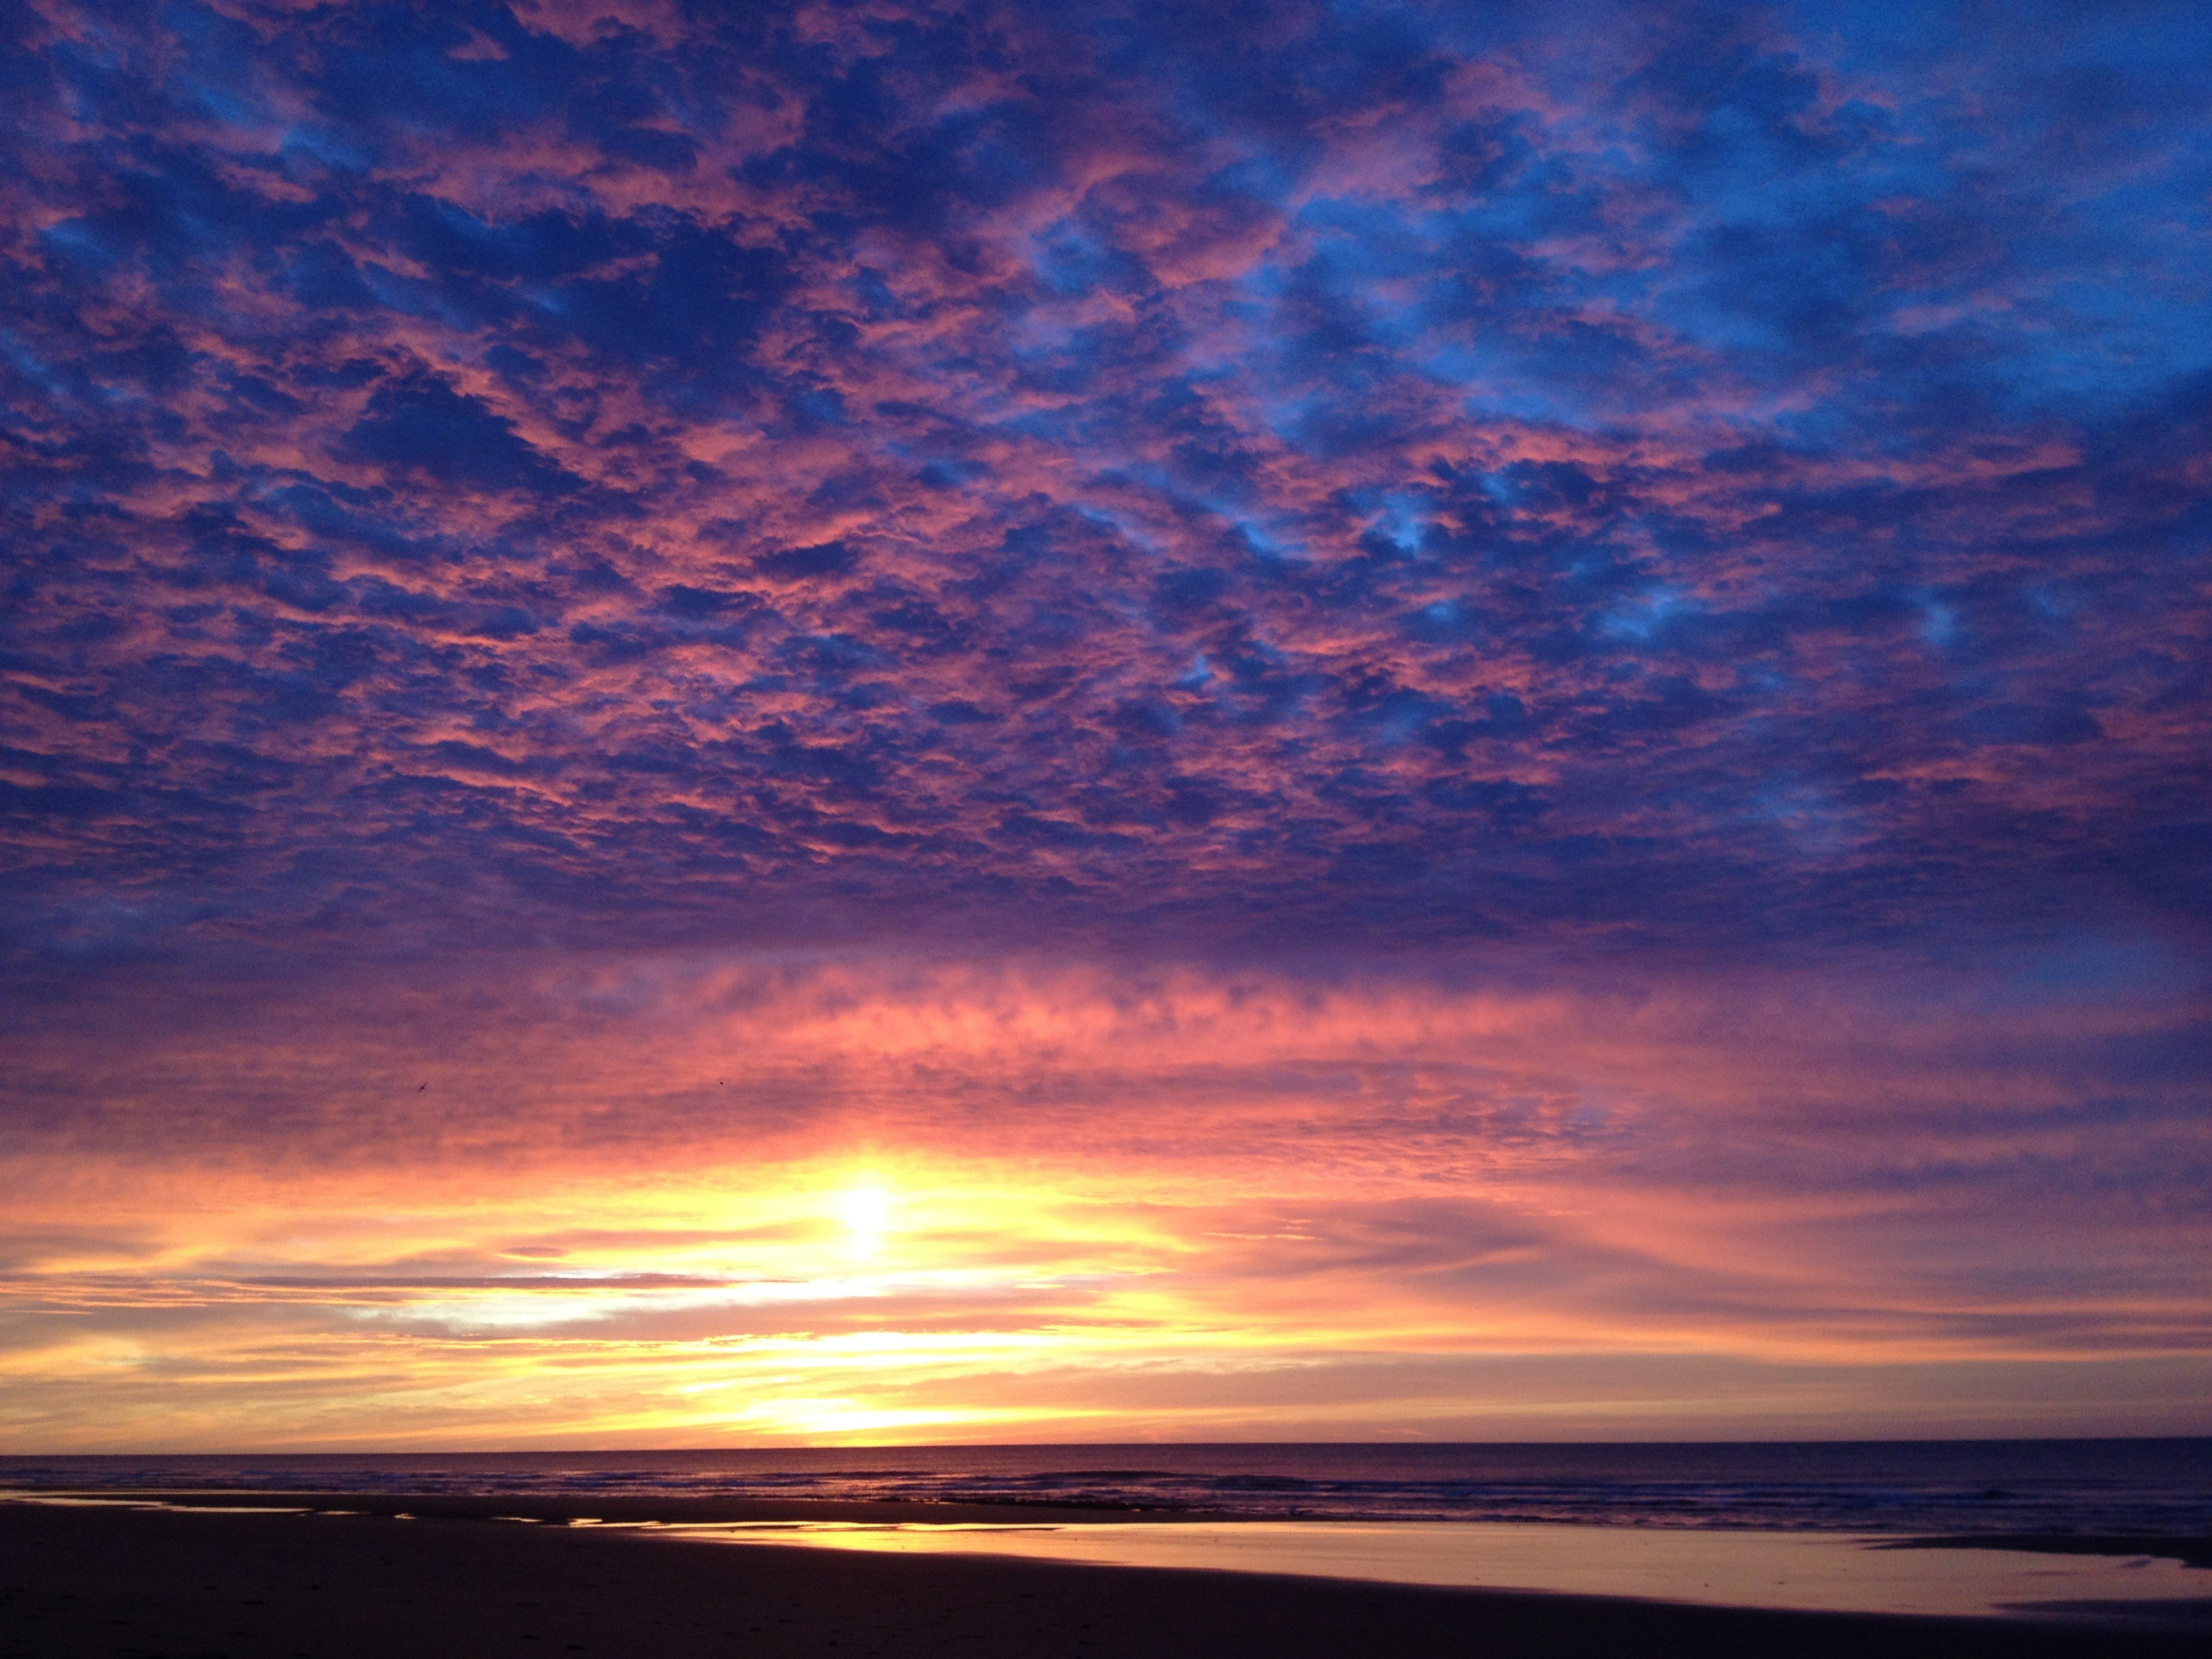 Sunset at Pehuen-Có, Argentina I © Kristin Deasy